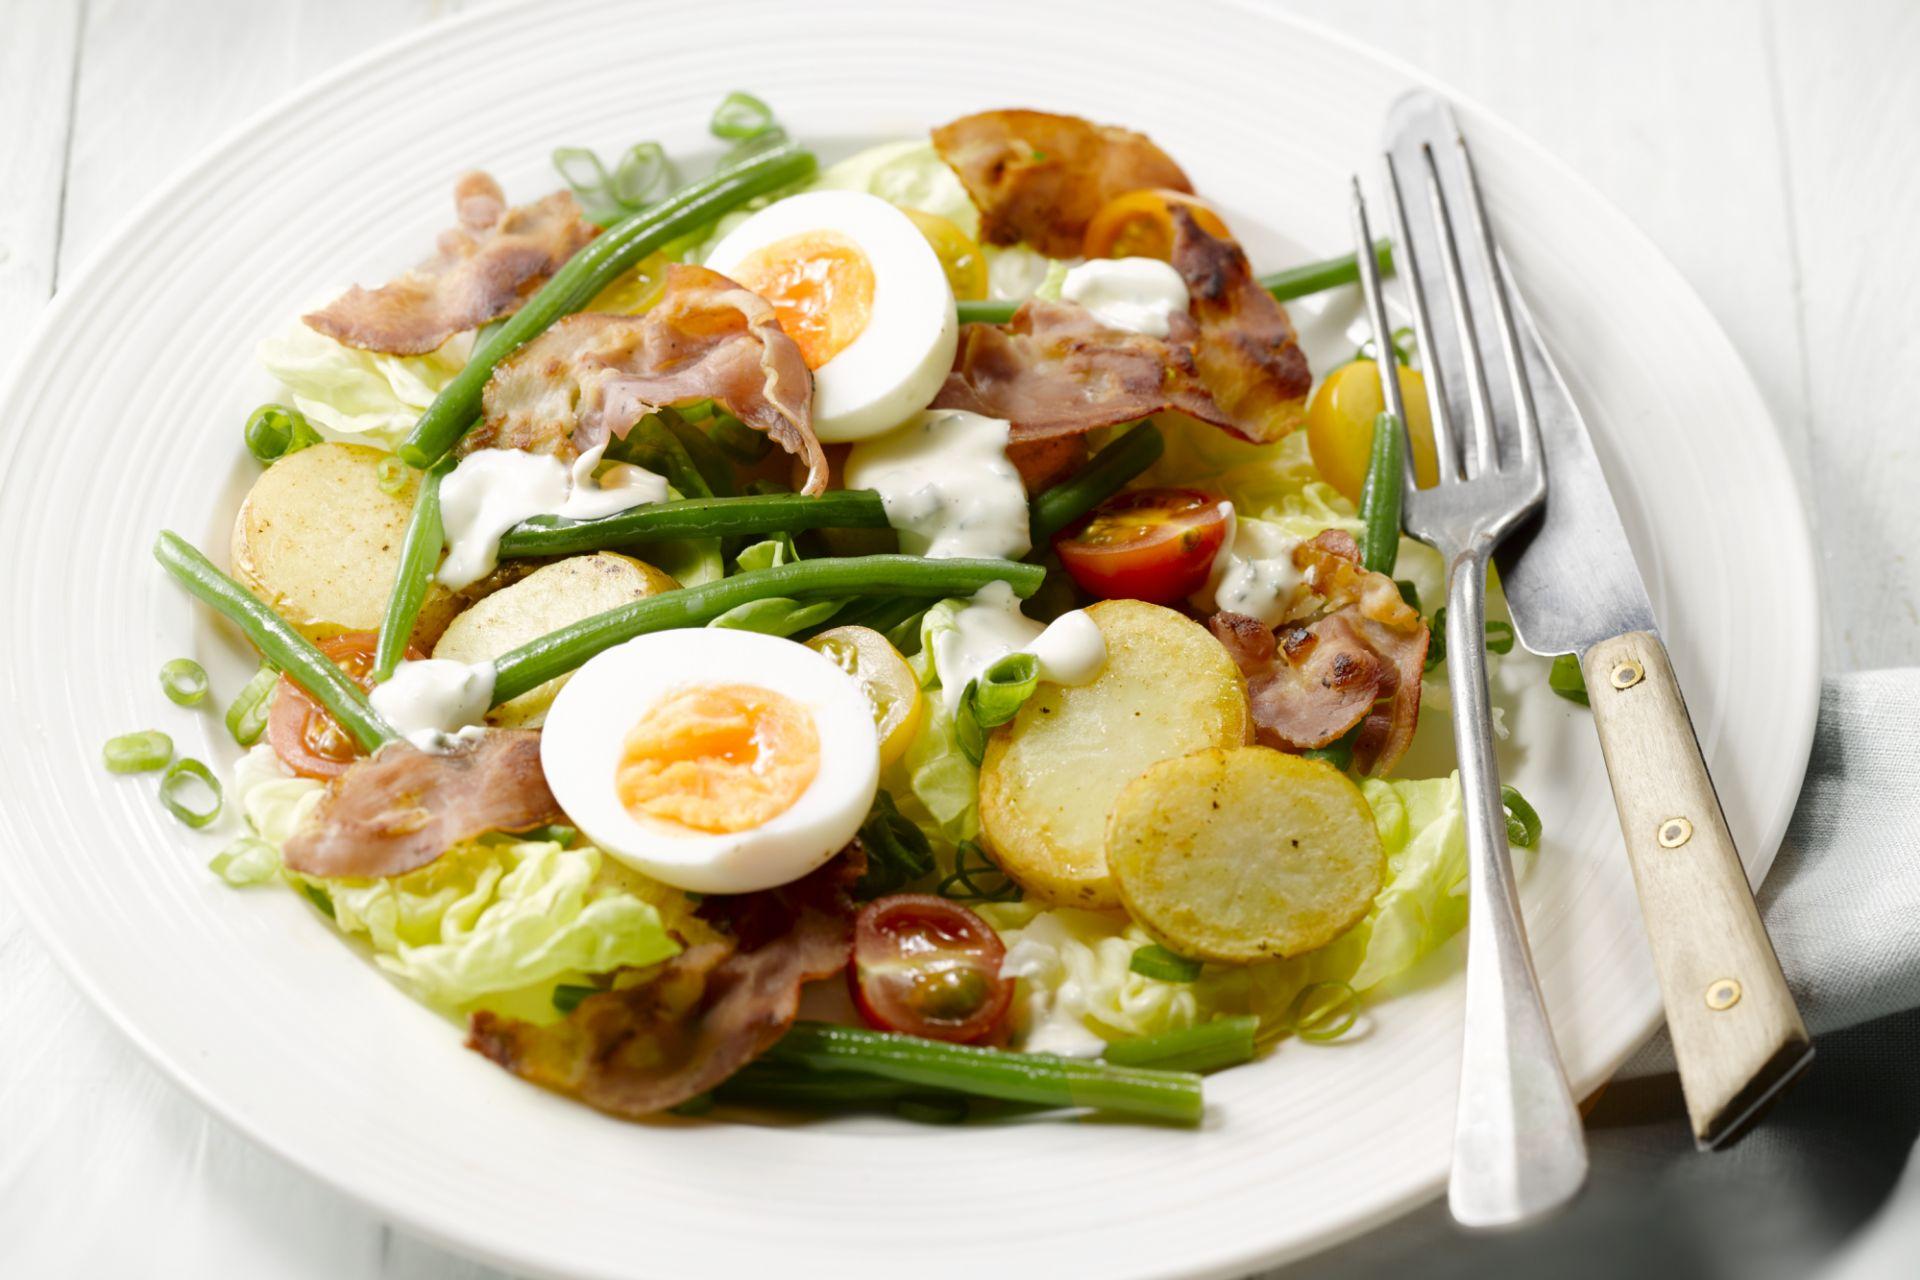 Aardappelsalade met krokante pancetta en ei